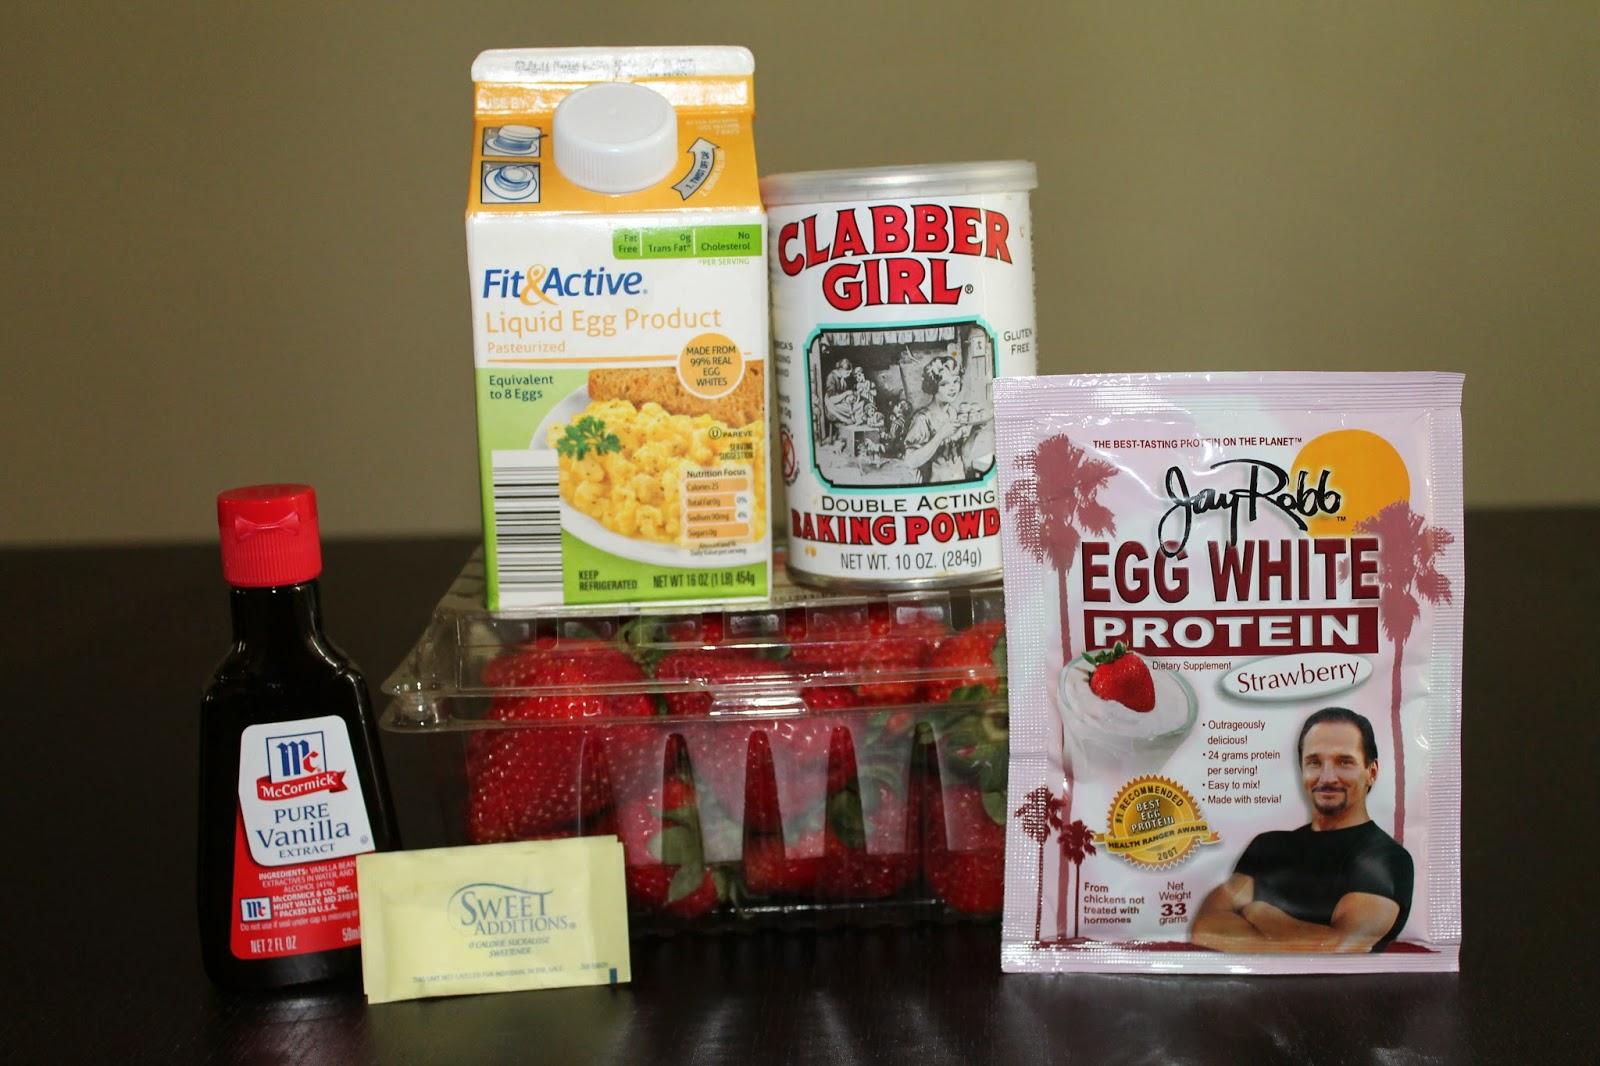 Strawberry Protein Powder Strawberry or Vanilla Protein